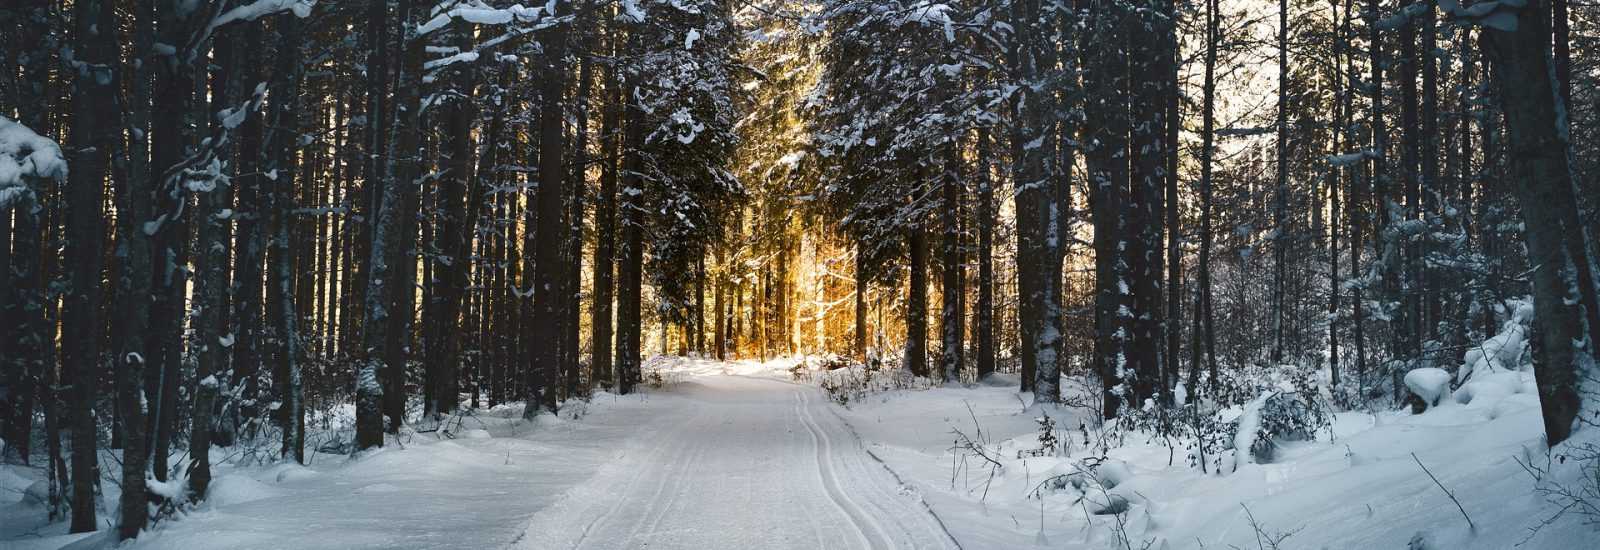 cross-country-skiing-2065439_1920